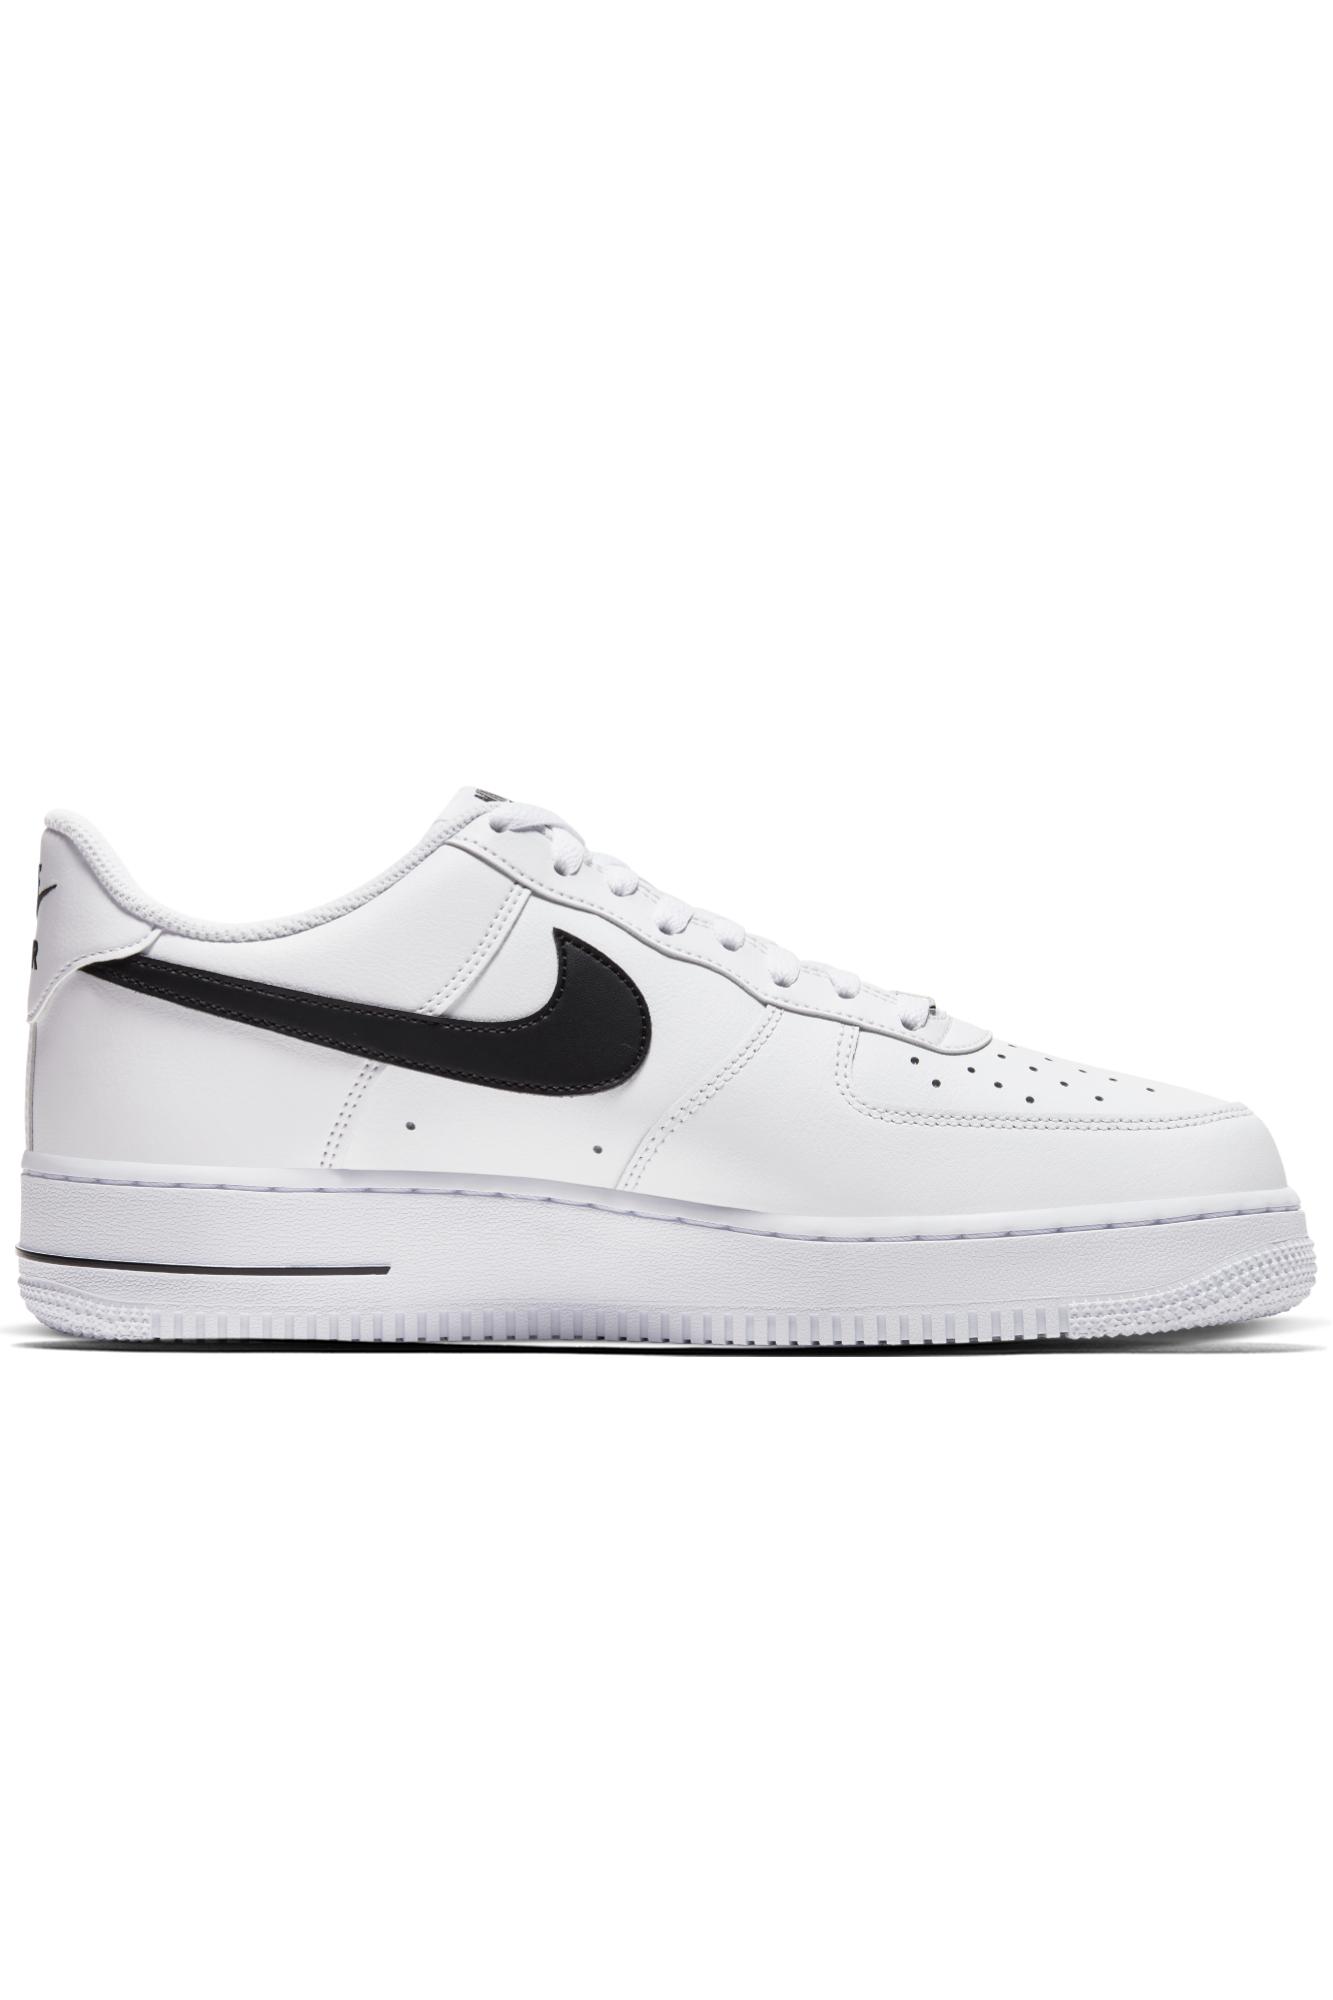 Buty Nike Air Force 1 '07 CJ0952 100 Na co dzień Buty